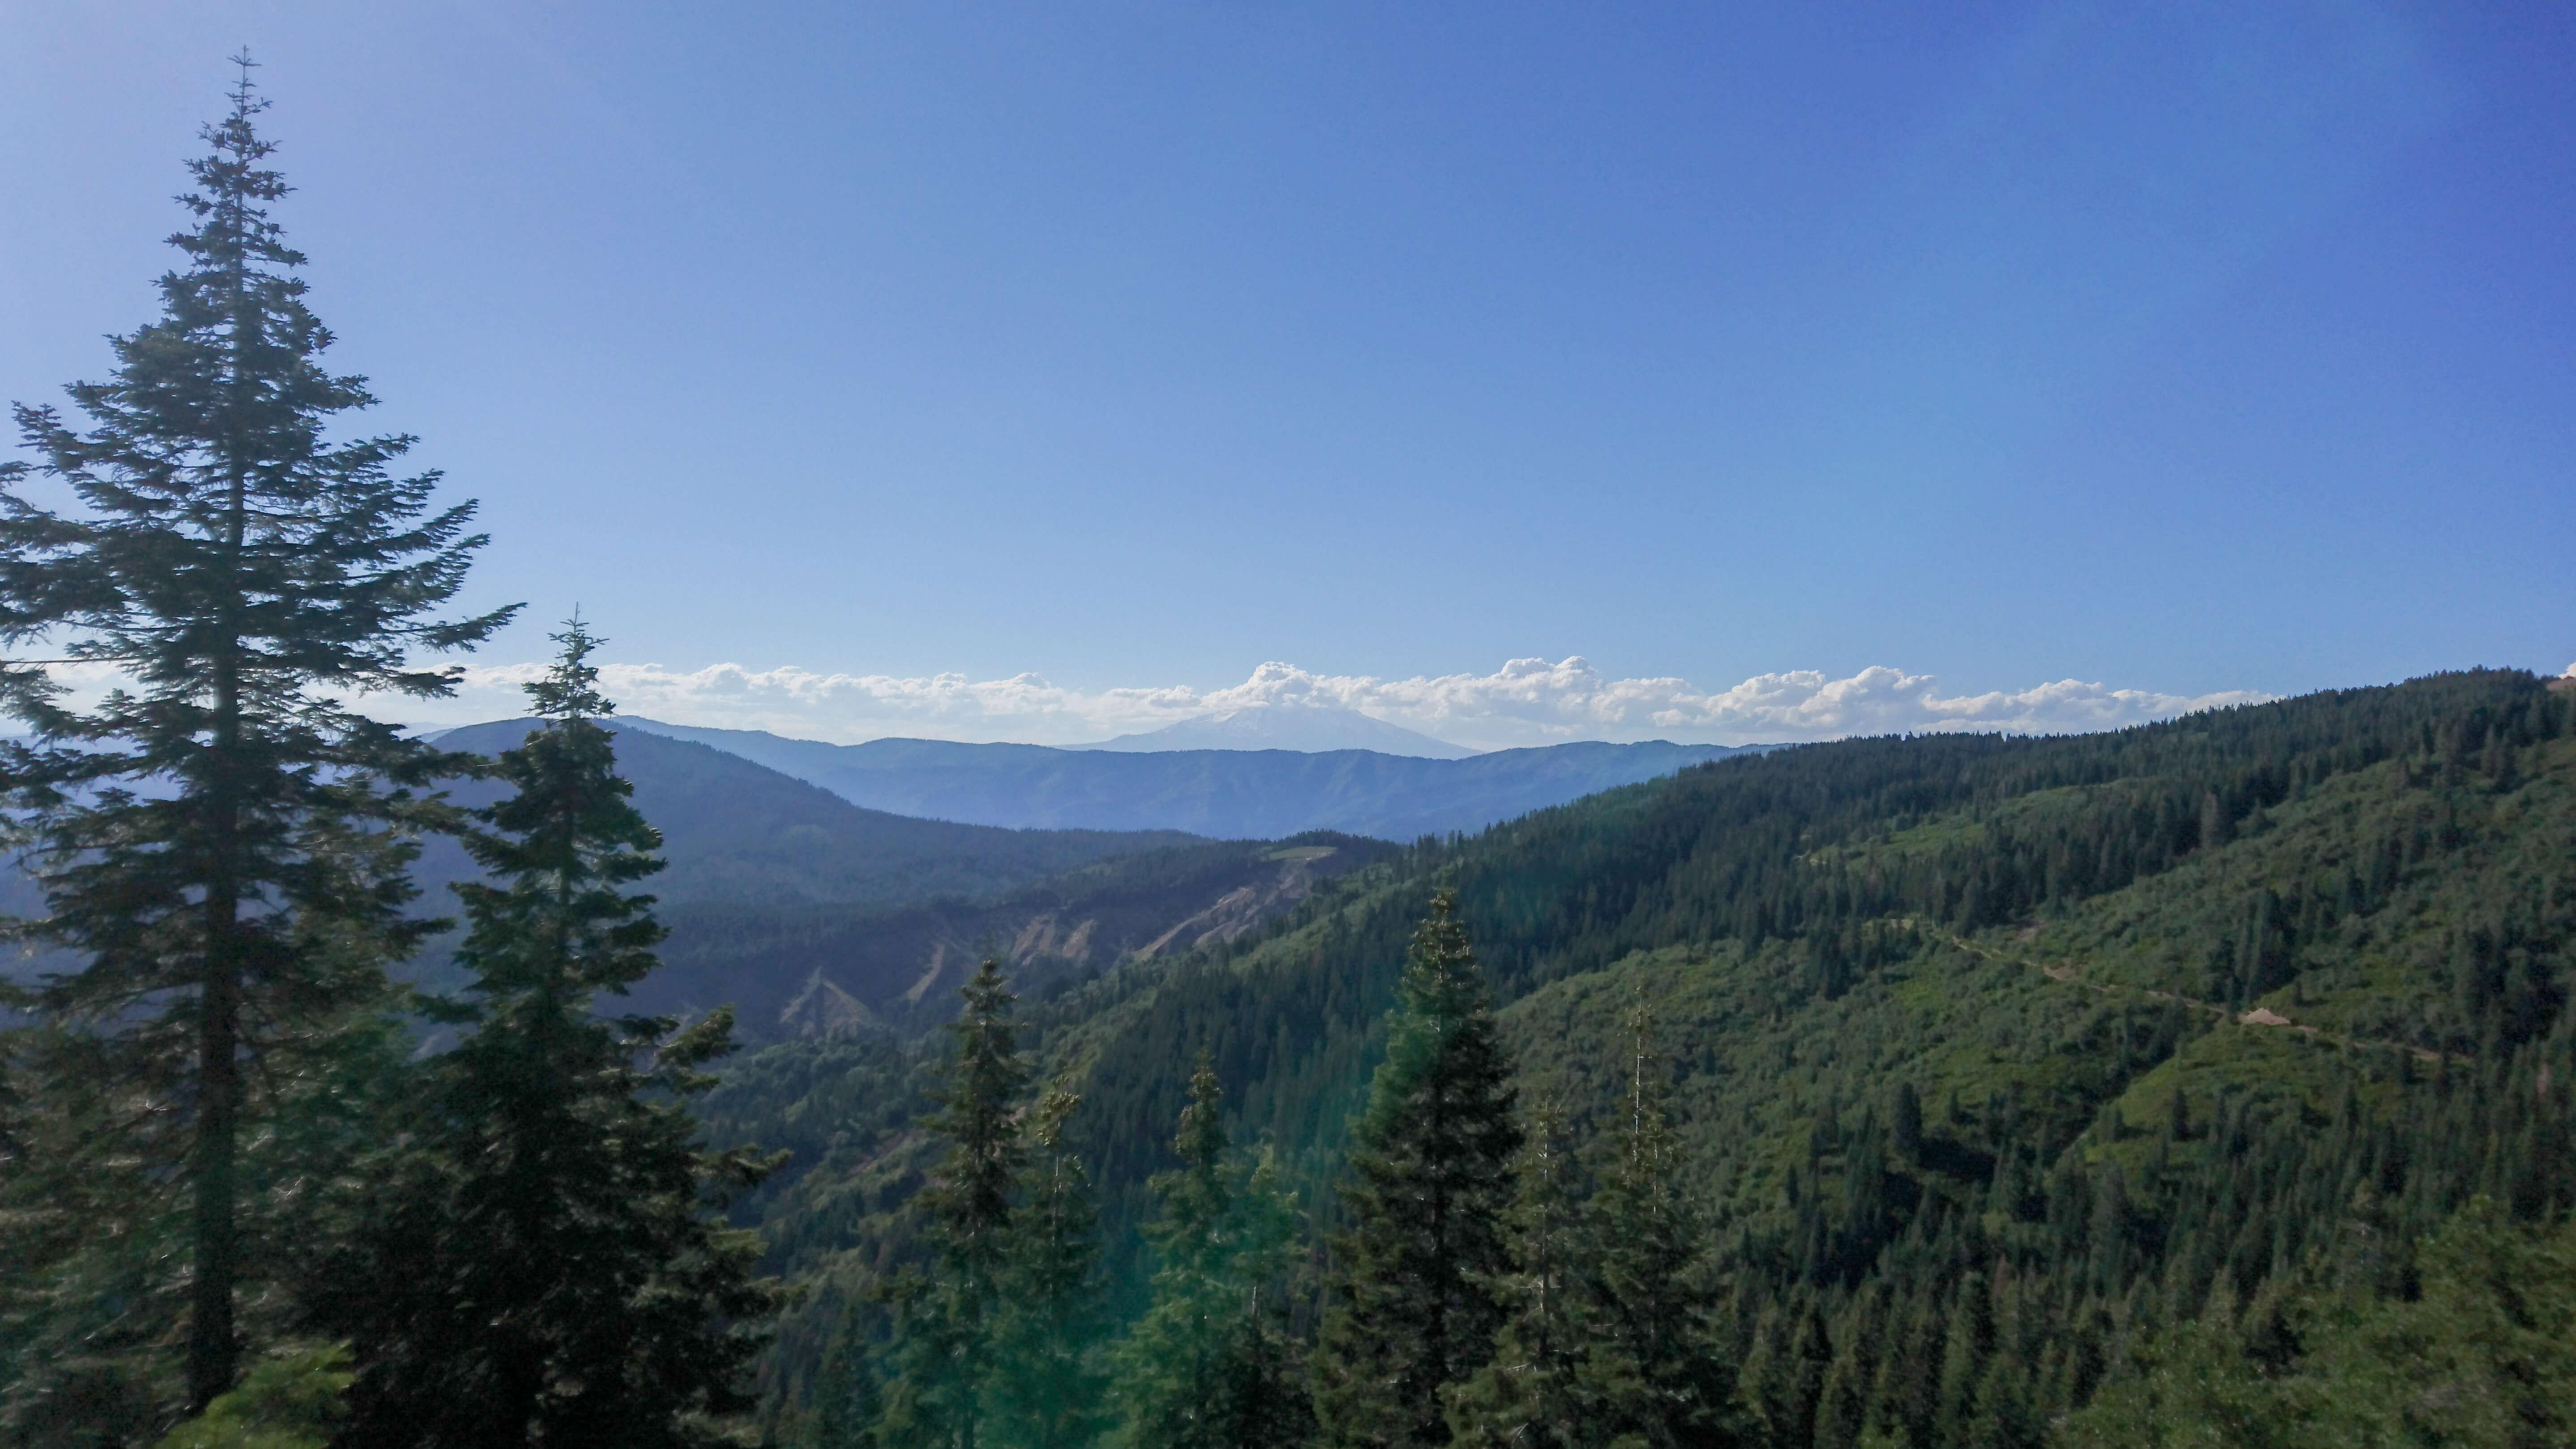 En approche du Mont Shasta